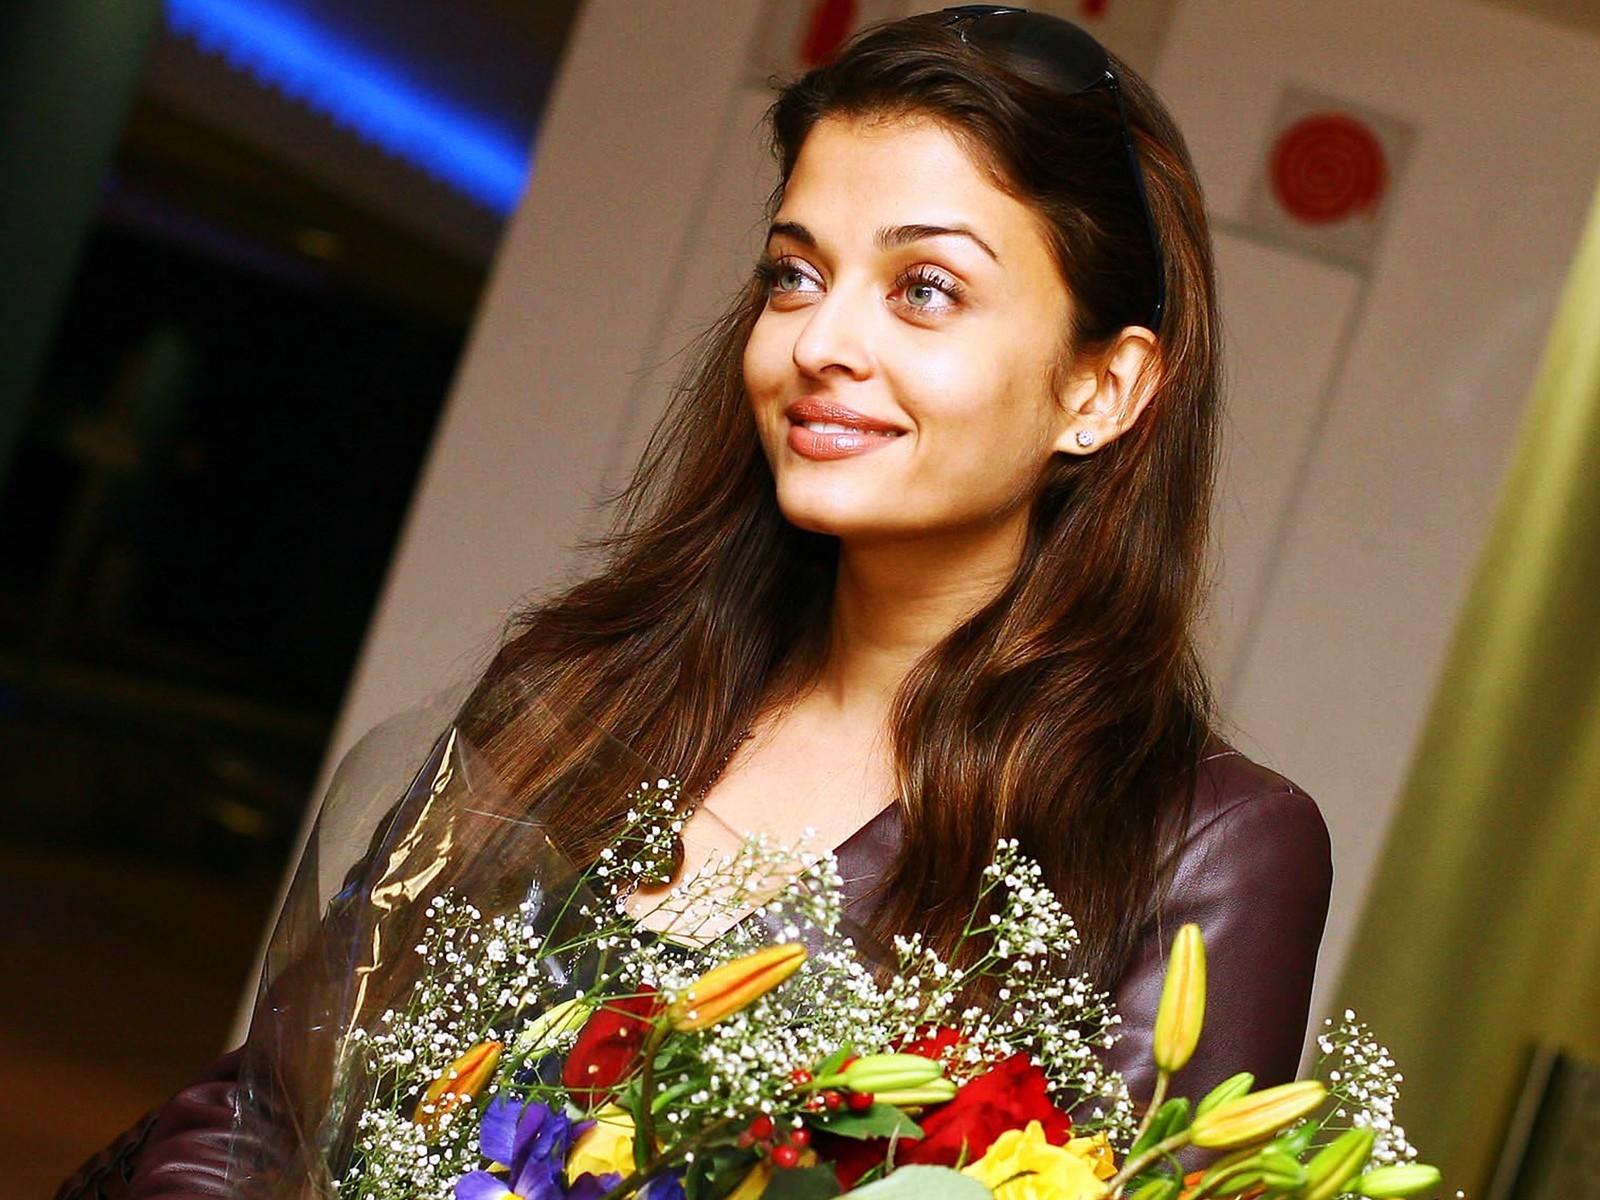 3d Wallpaper Natural Beauty Aishwarya Rai Beauty In Flowers Wallpapers Hd Wallpapers